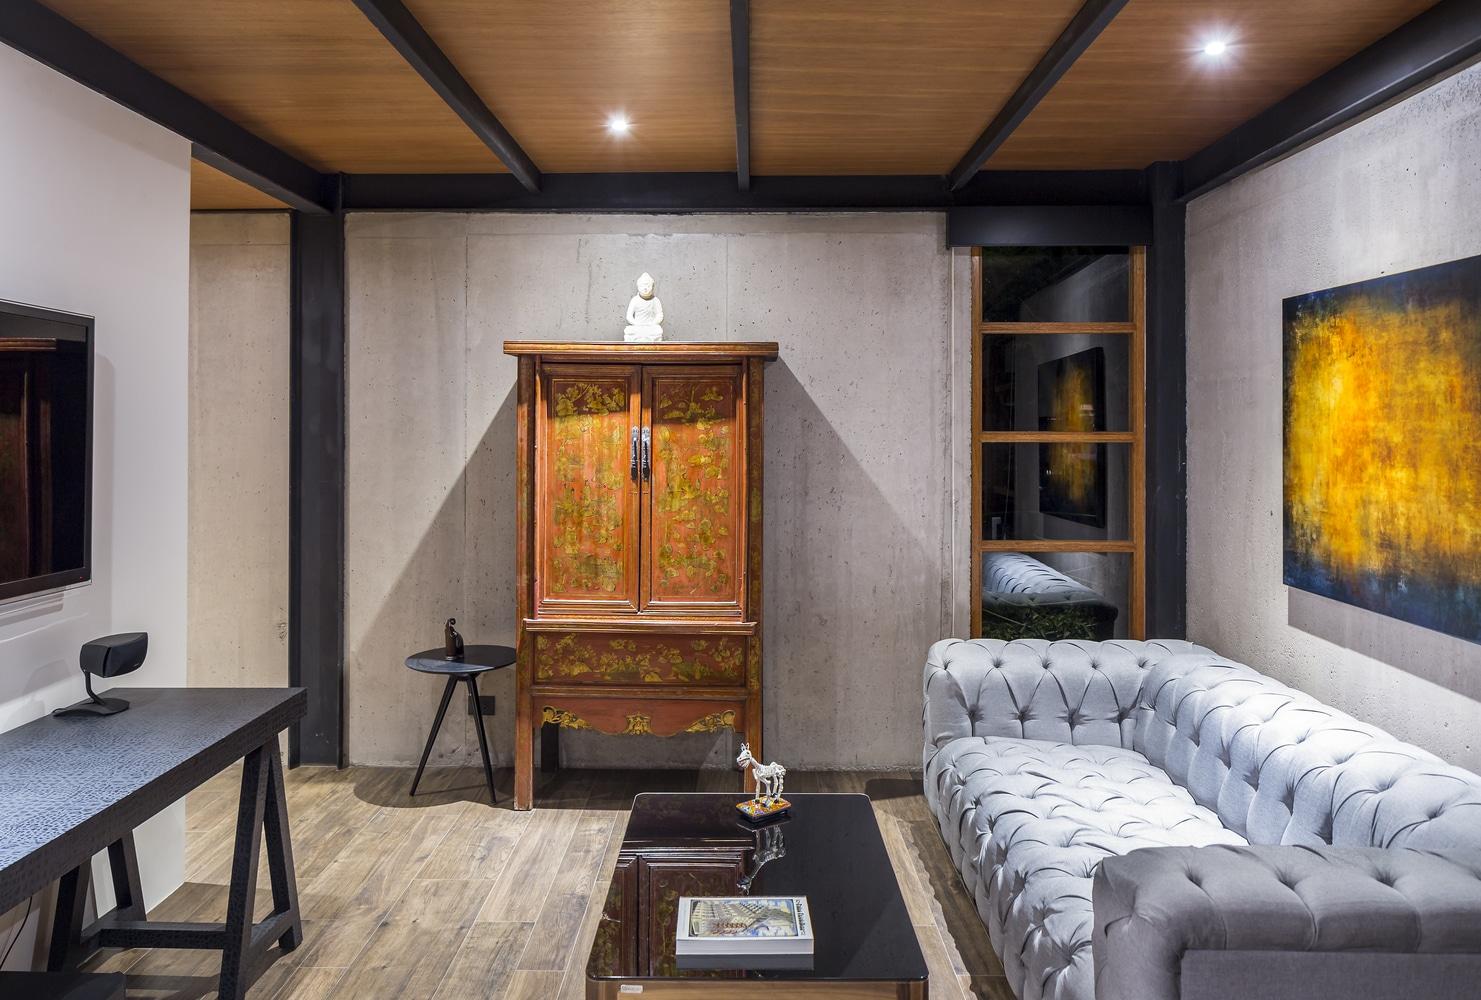 Peque a casa de dos pisos de 95 m construye hogar for Paredes de madera interior casa